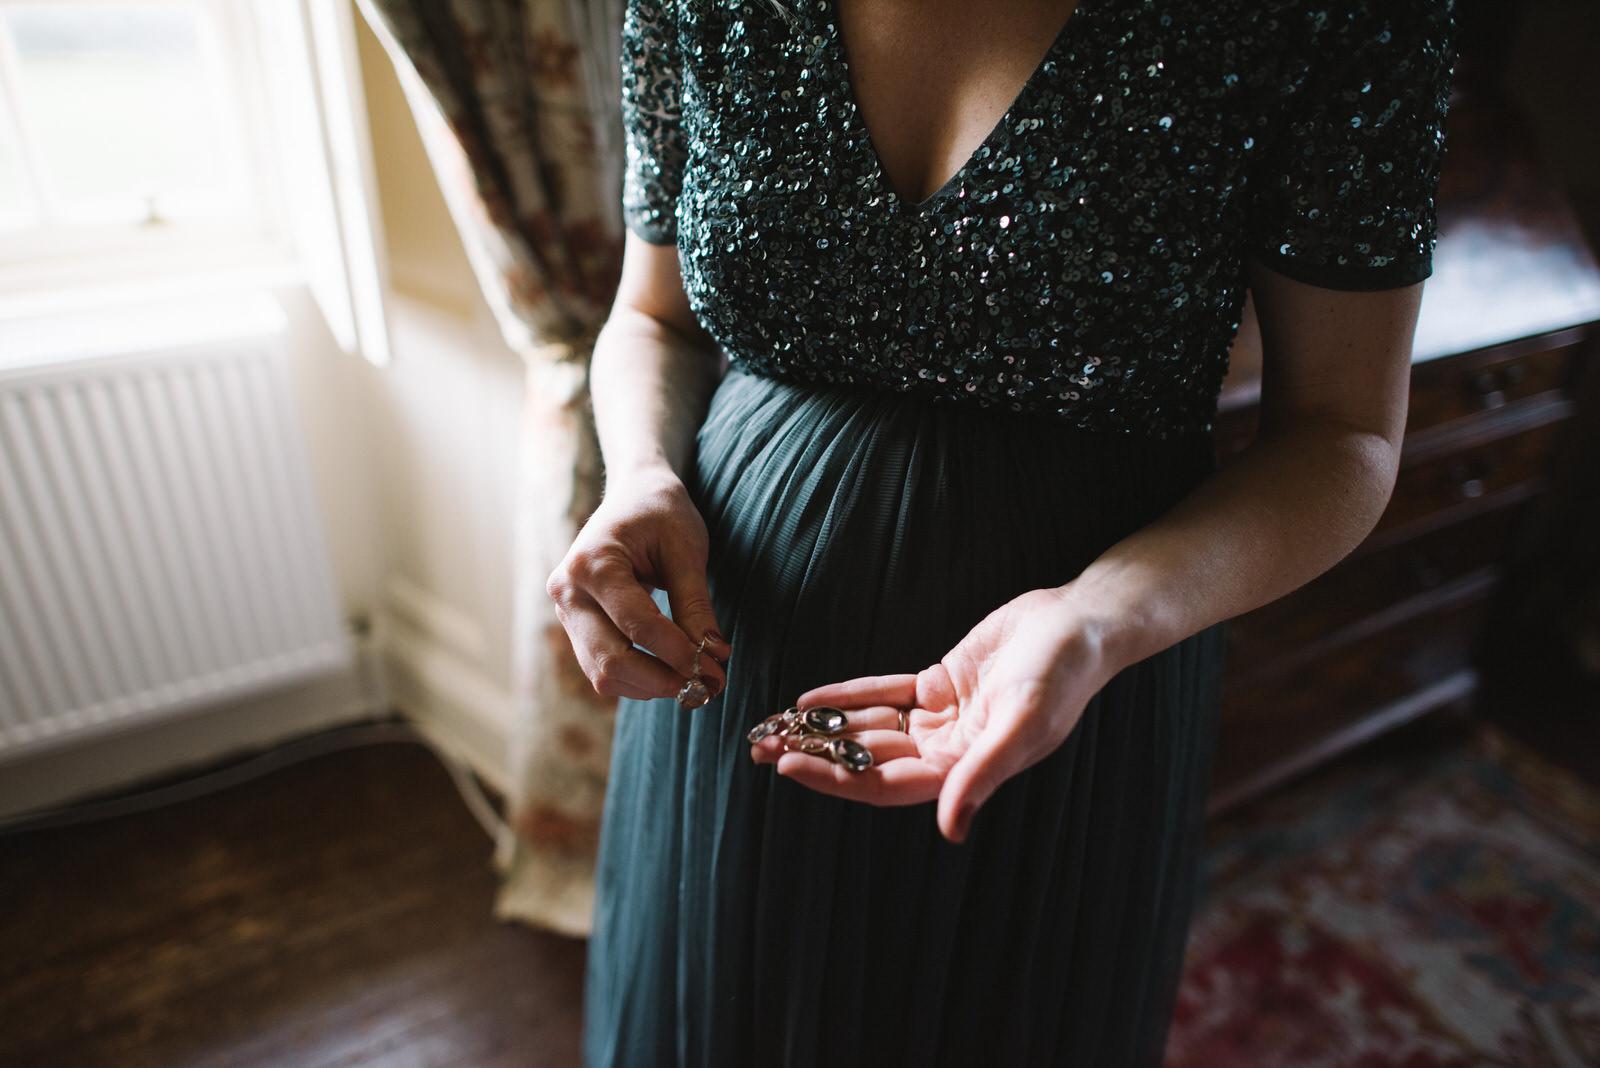 014-COLSTOUN-HOUSE-WEDDING-ALTERNATIVE-WEDDING-PHOTOGRAPHER-GLASGOW-WEDDING-PHOTOGRAPHER-STYLISH-SCOTTISH-WEDDING.JPG